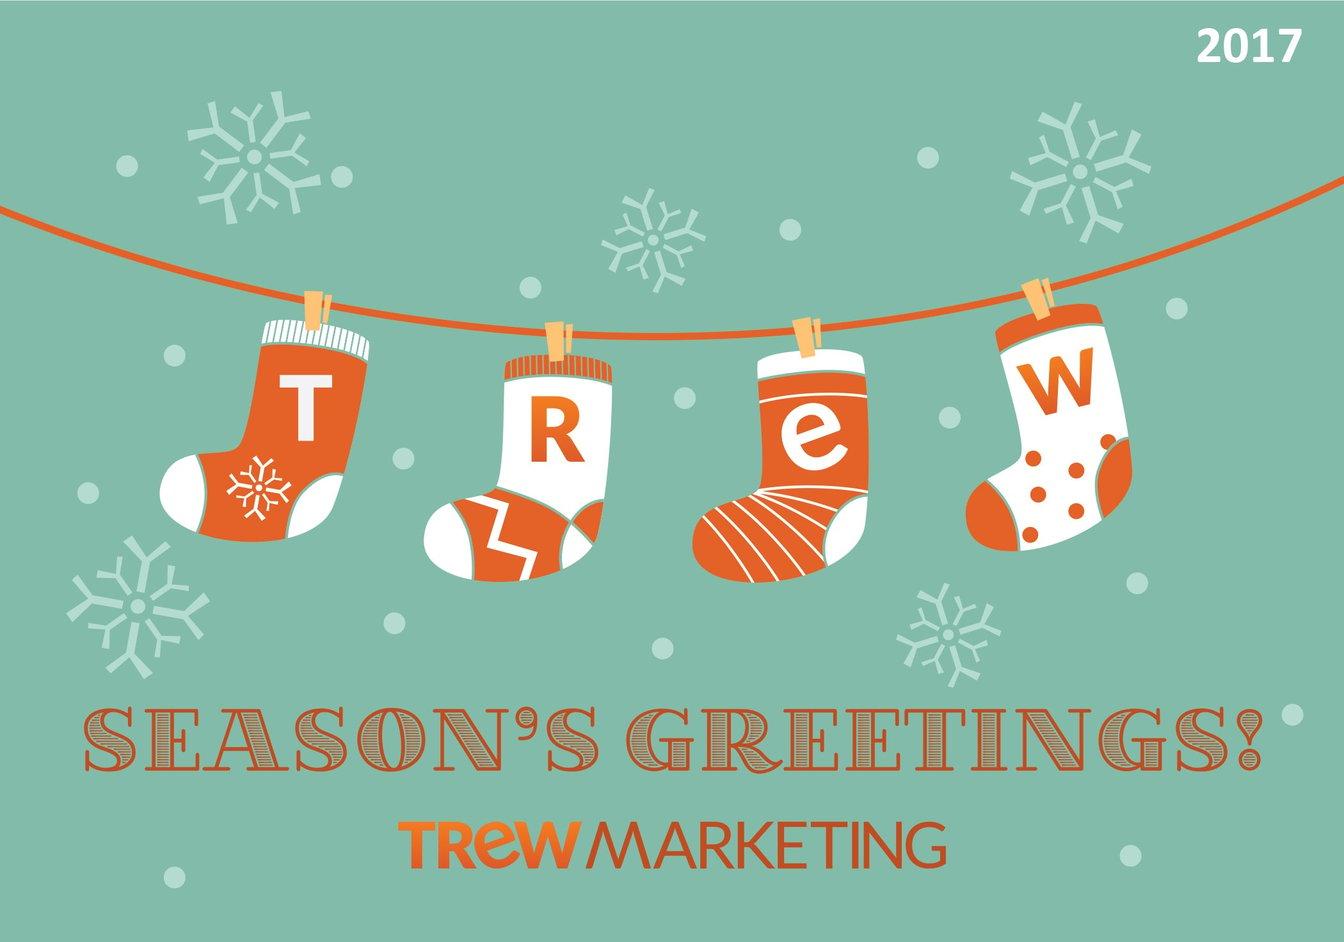 11_17_TREW_holiday_card.jpg